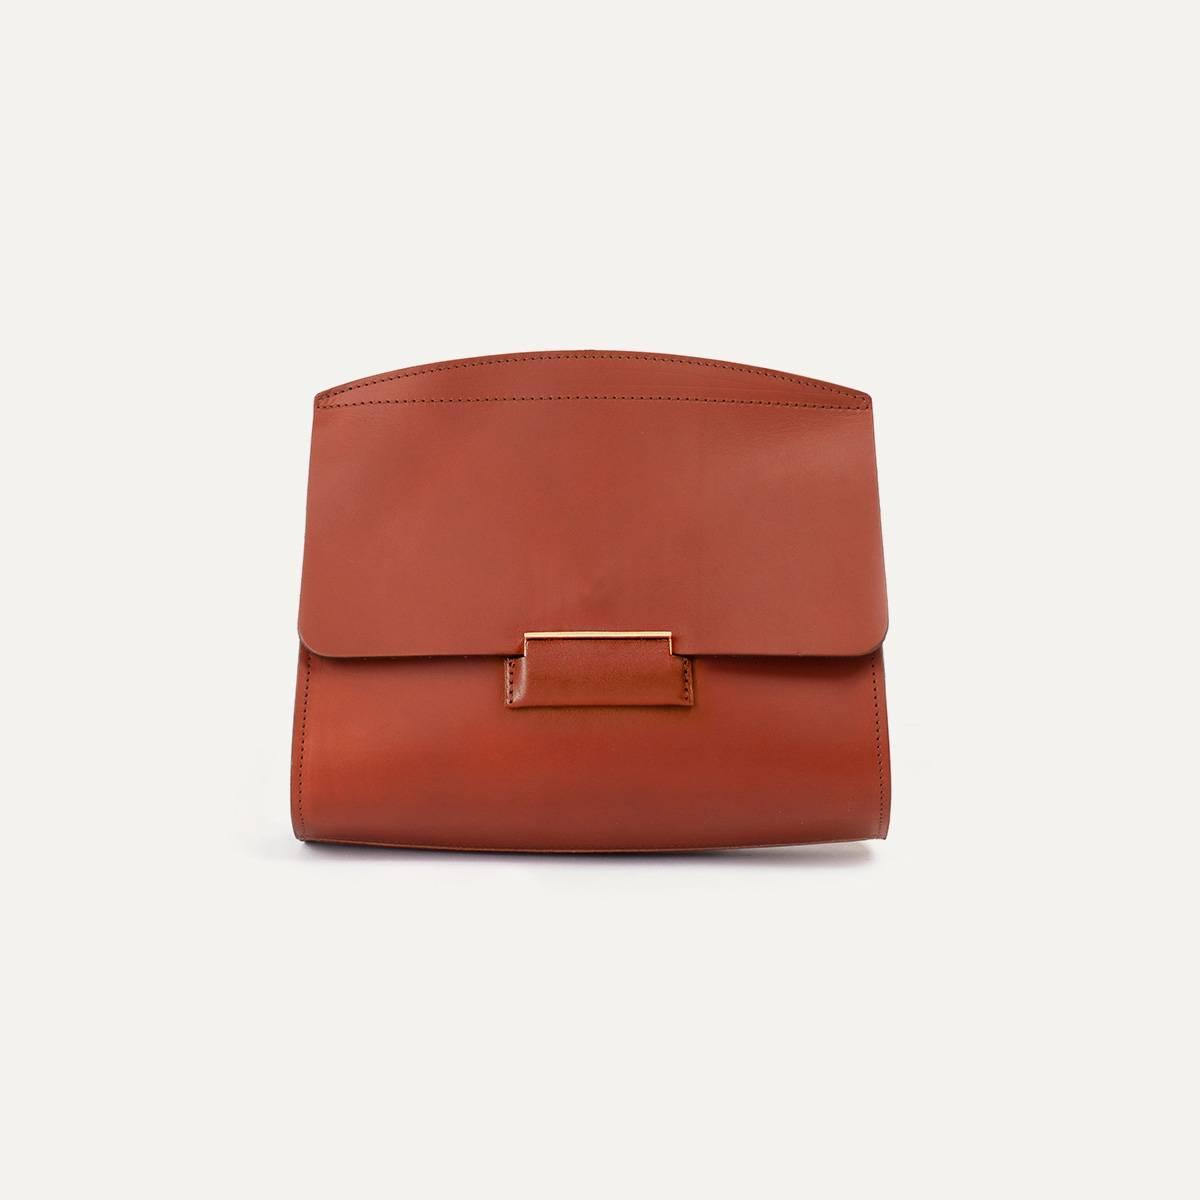 Origami S clutch bag - Rust (image n°4)